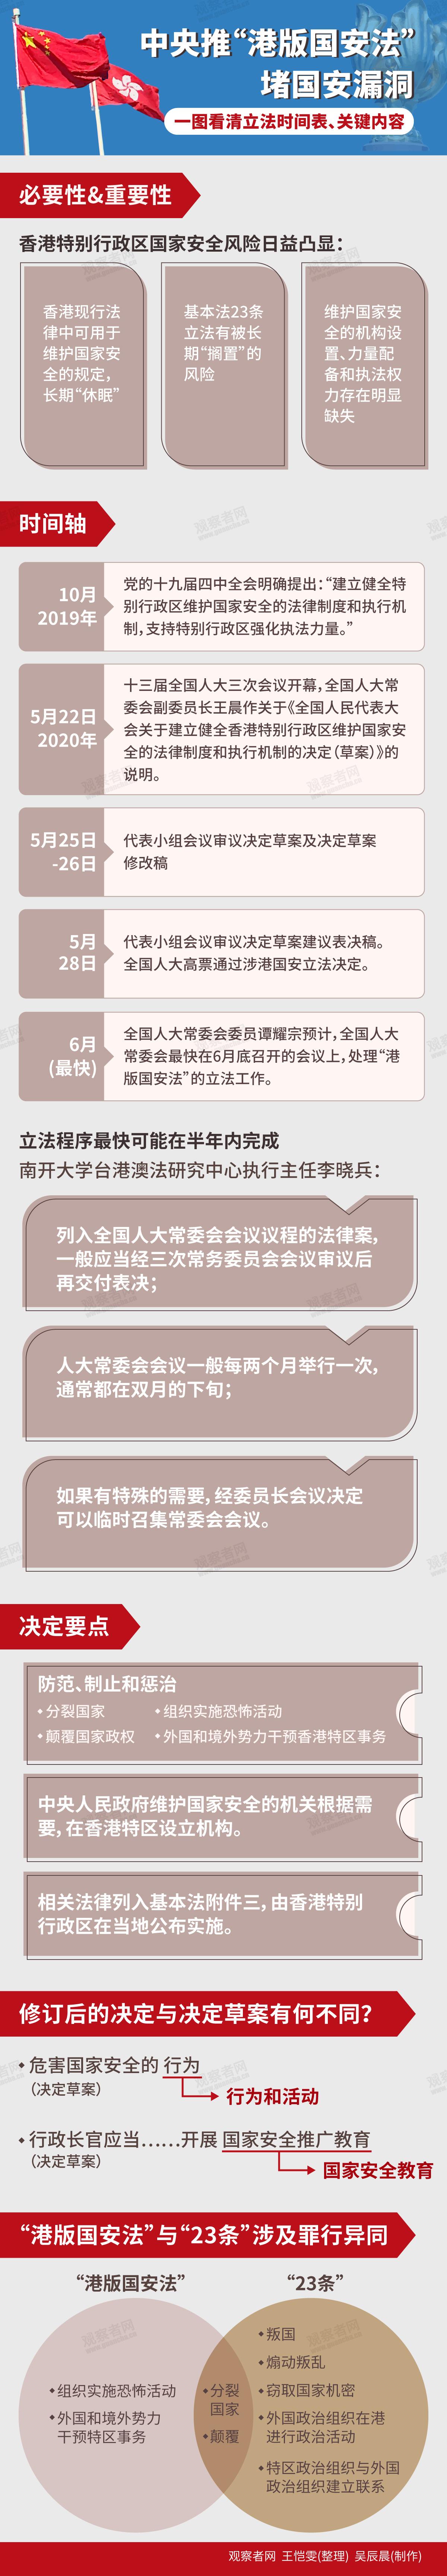 "【bch】_""港版国安法""决定文字有微调,一图看懂"